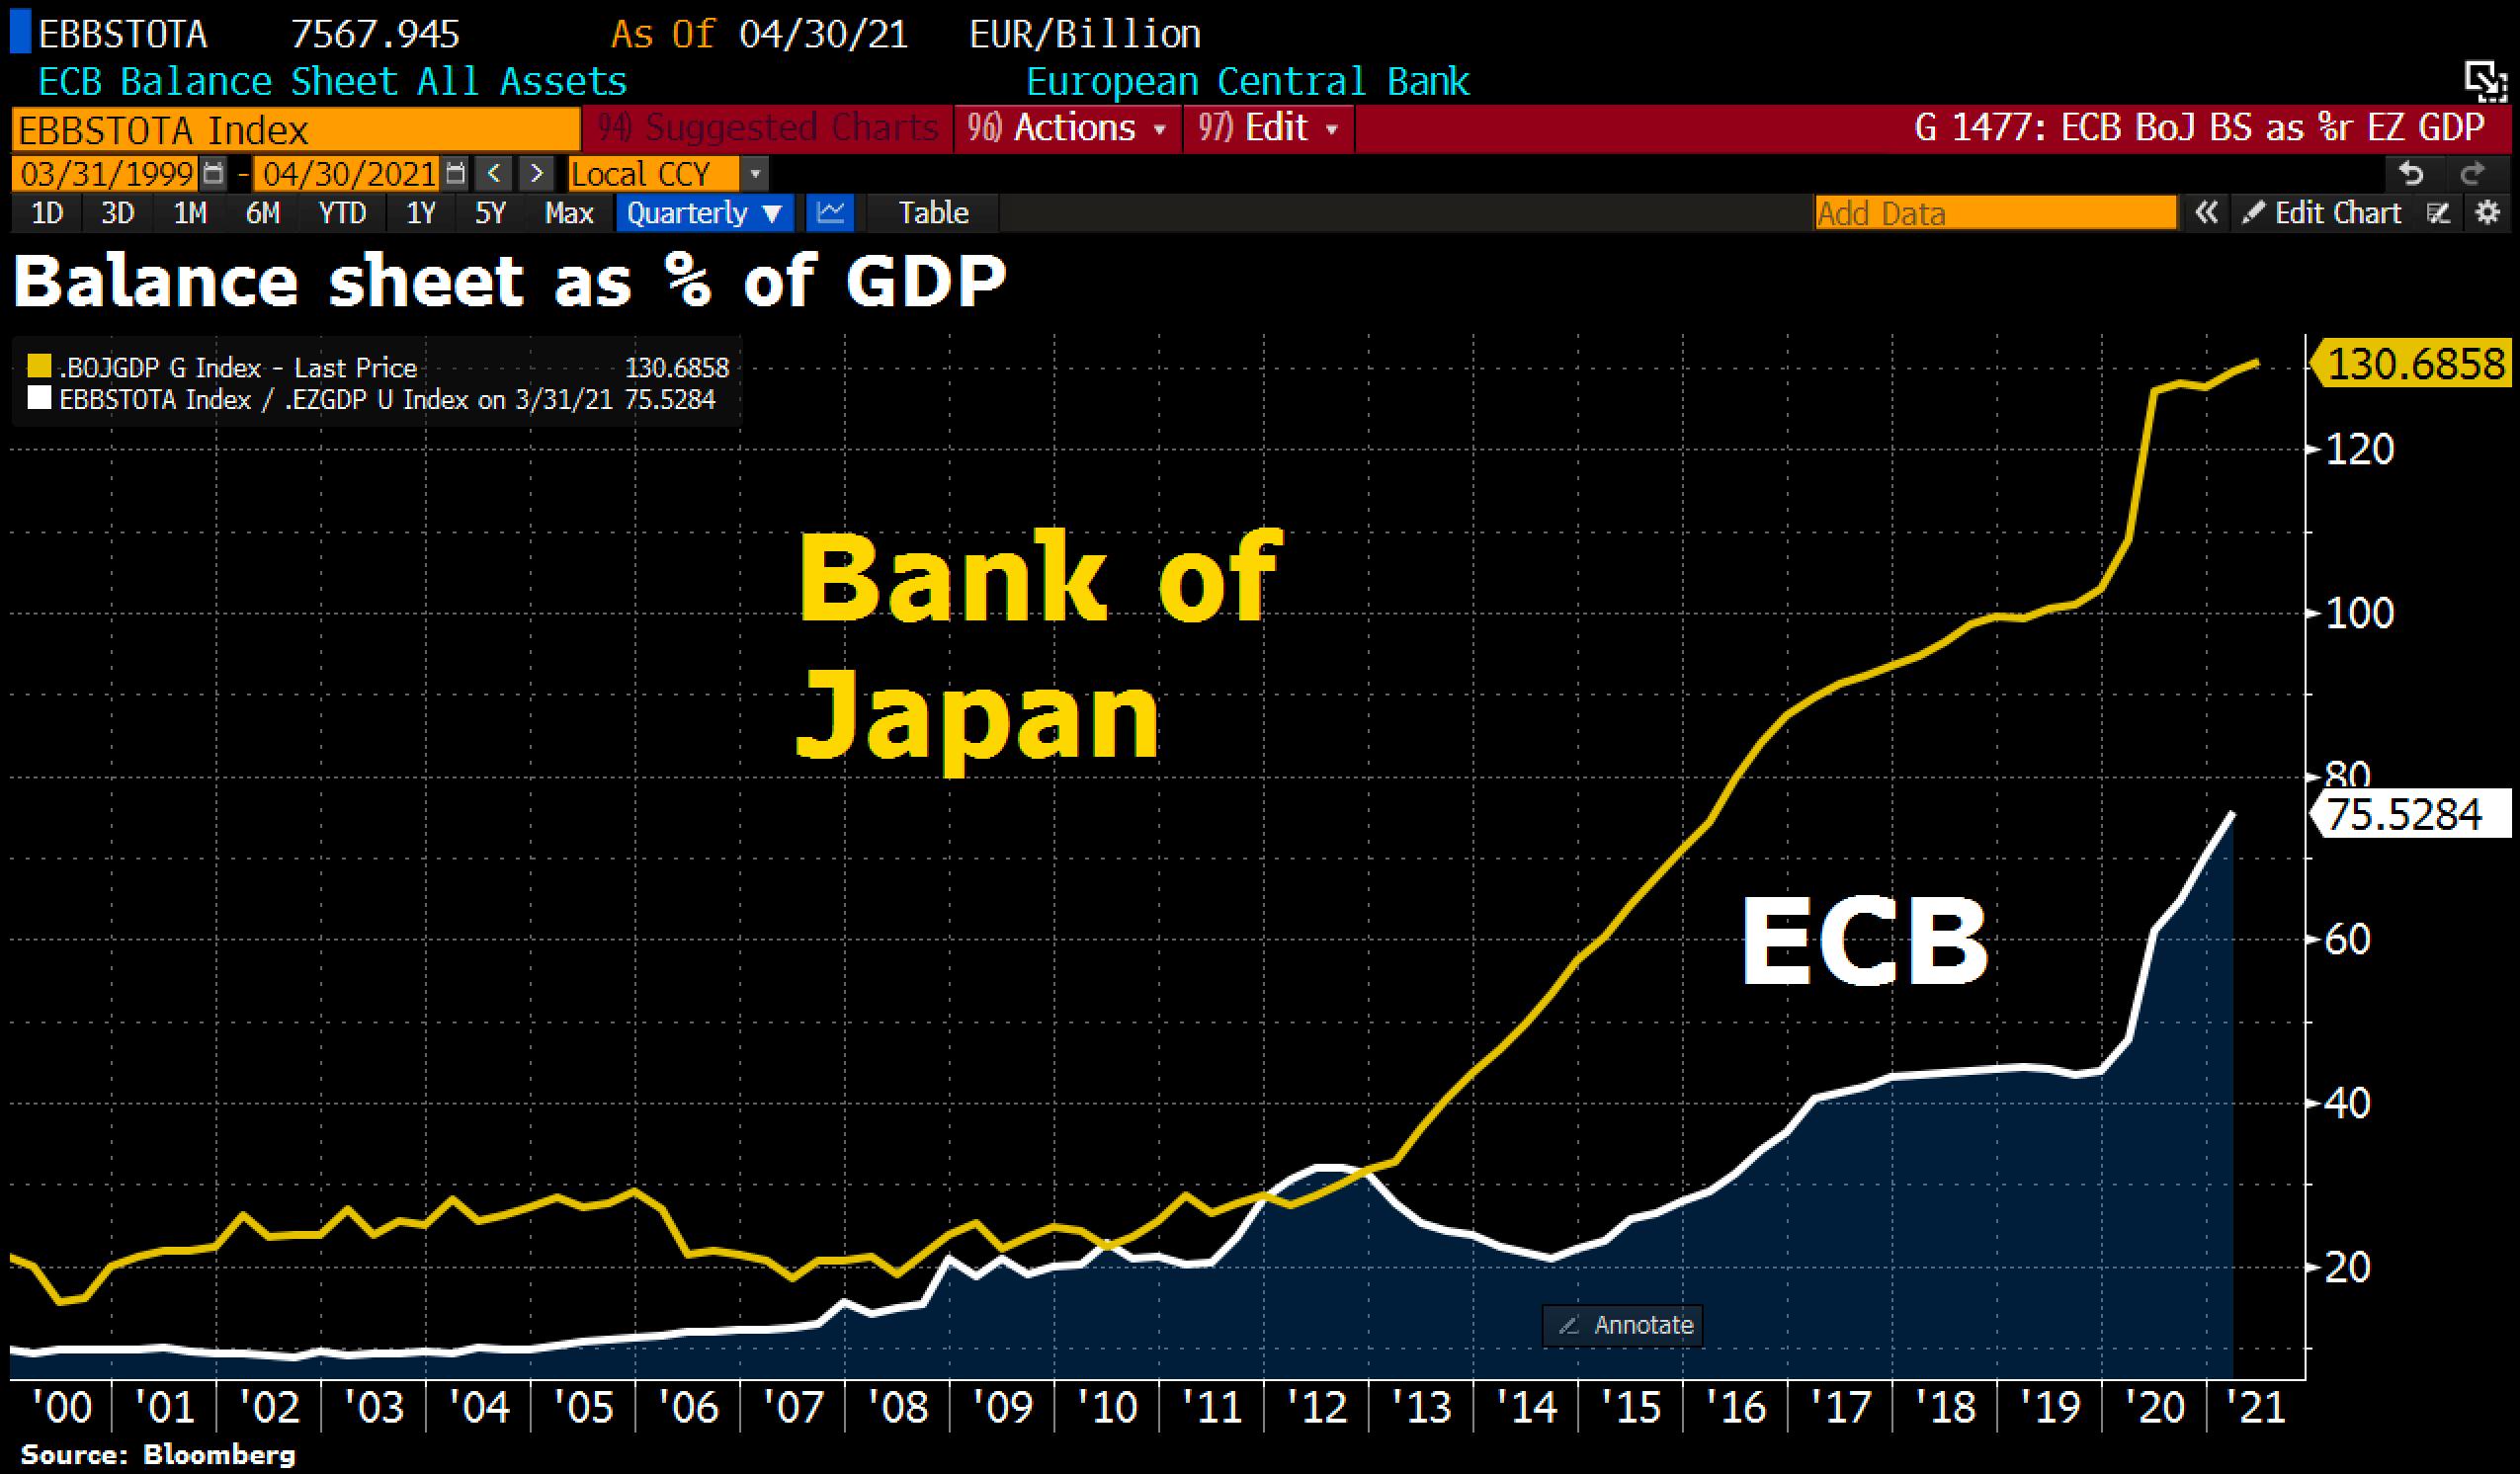 BoJ vs ECB Balance sheets